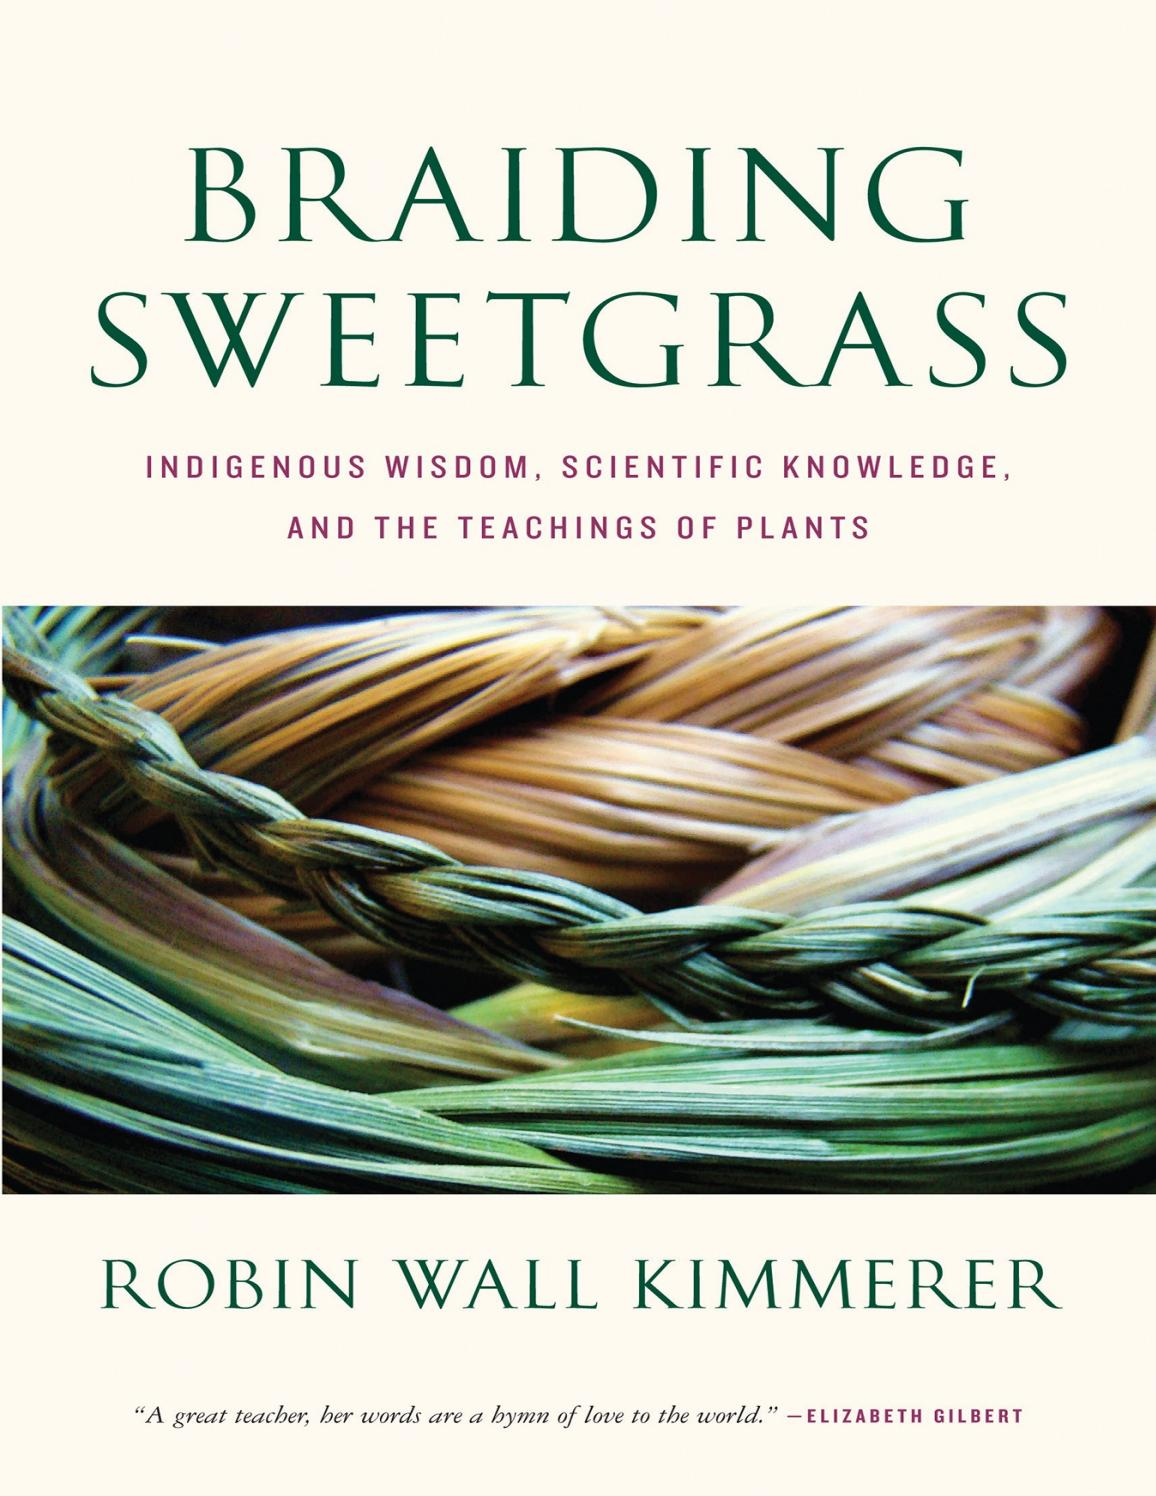 Braiding Sweetgrass_ Indigenous Wisdom, Scientific Knowledge